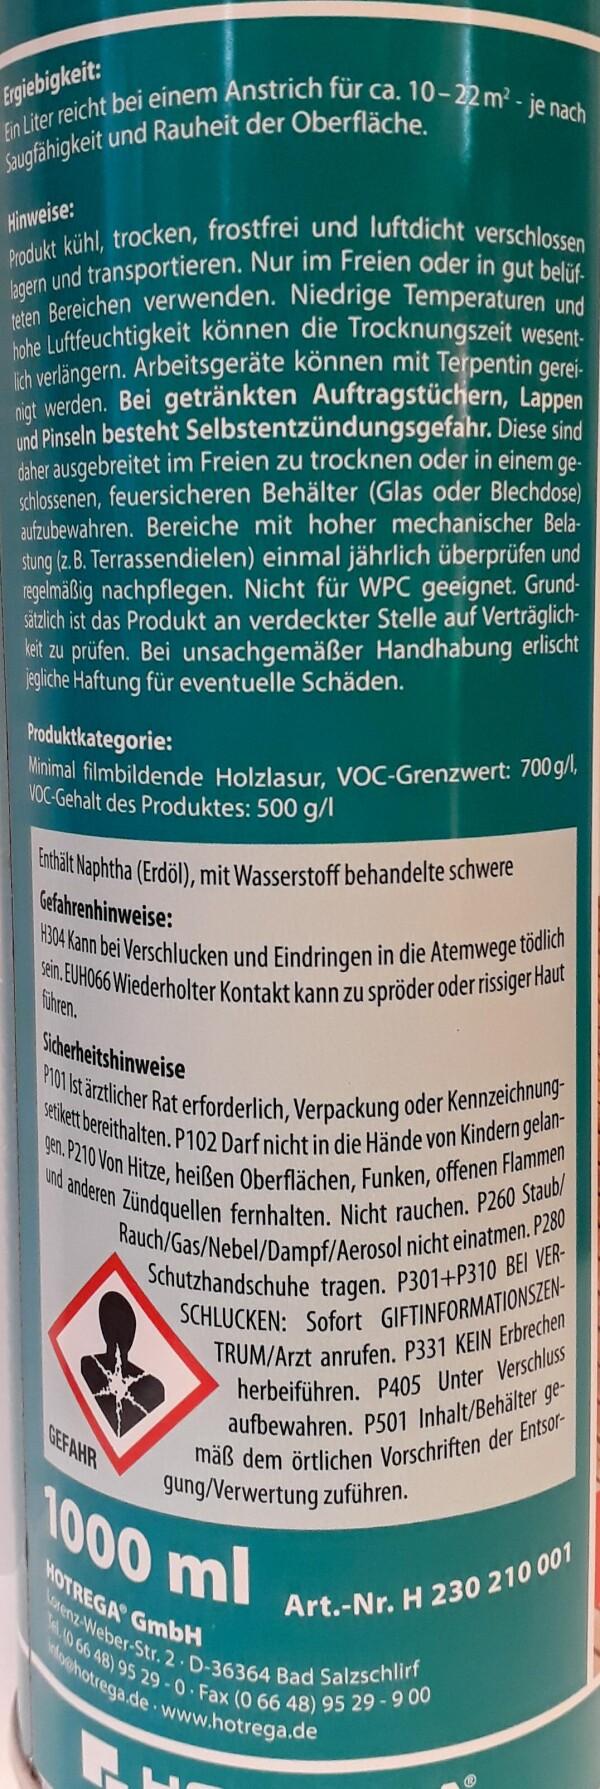 HOTREGA® teak and hardwood care oil | Haack am Markt